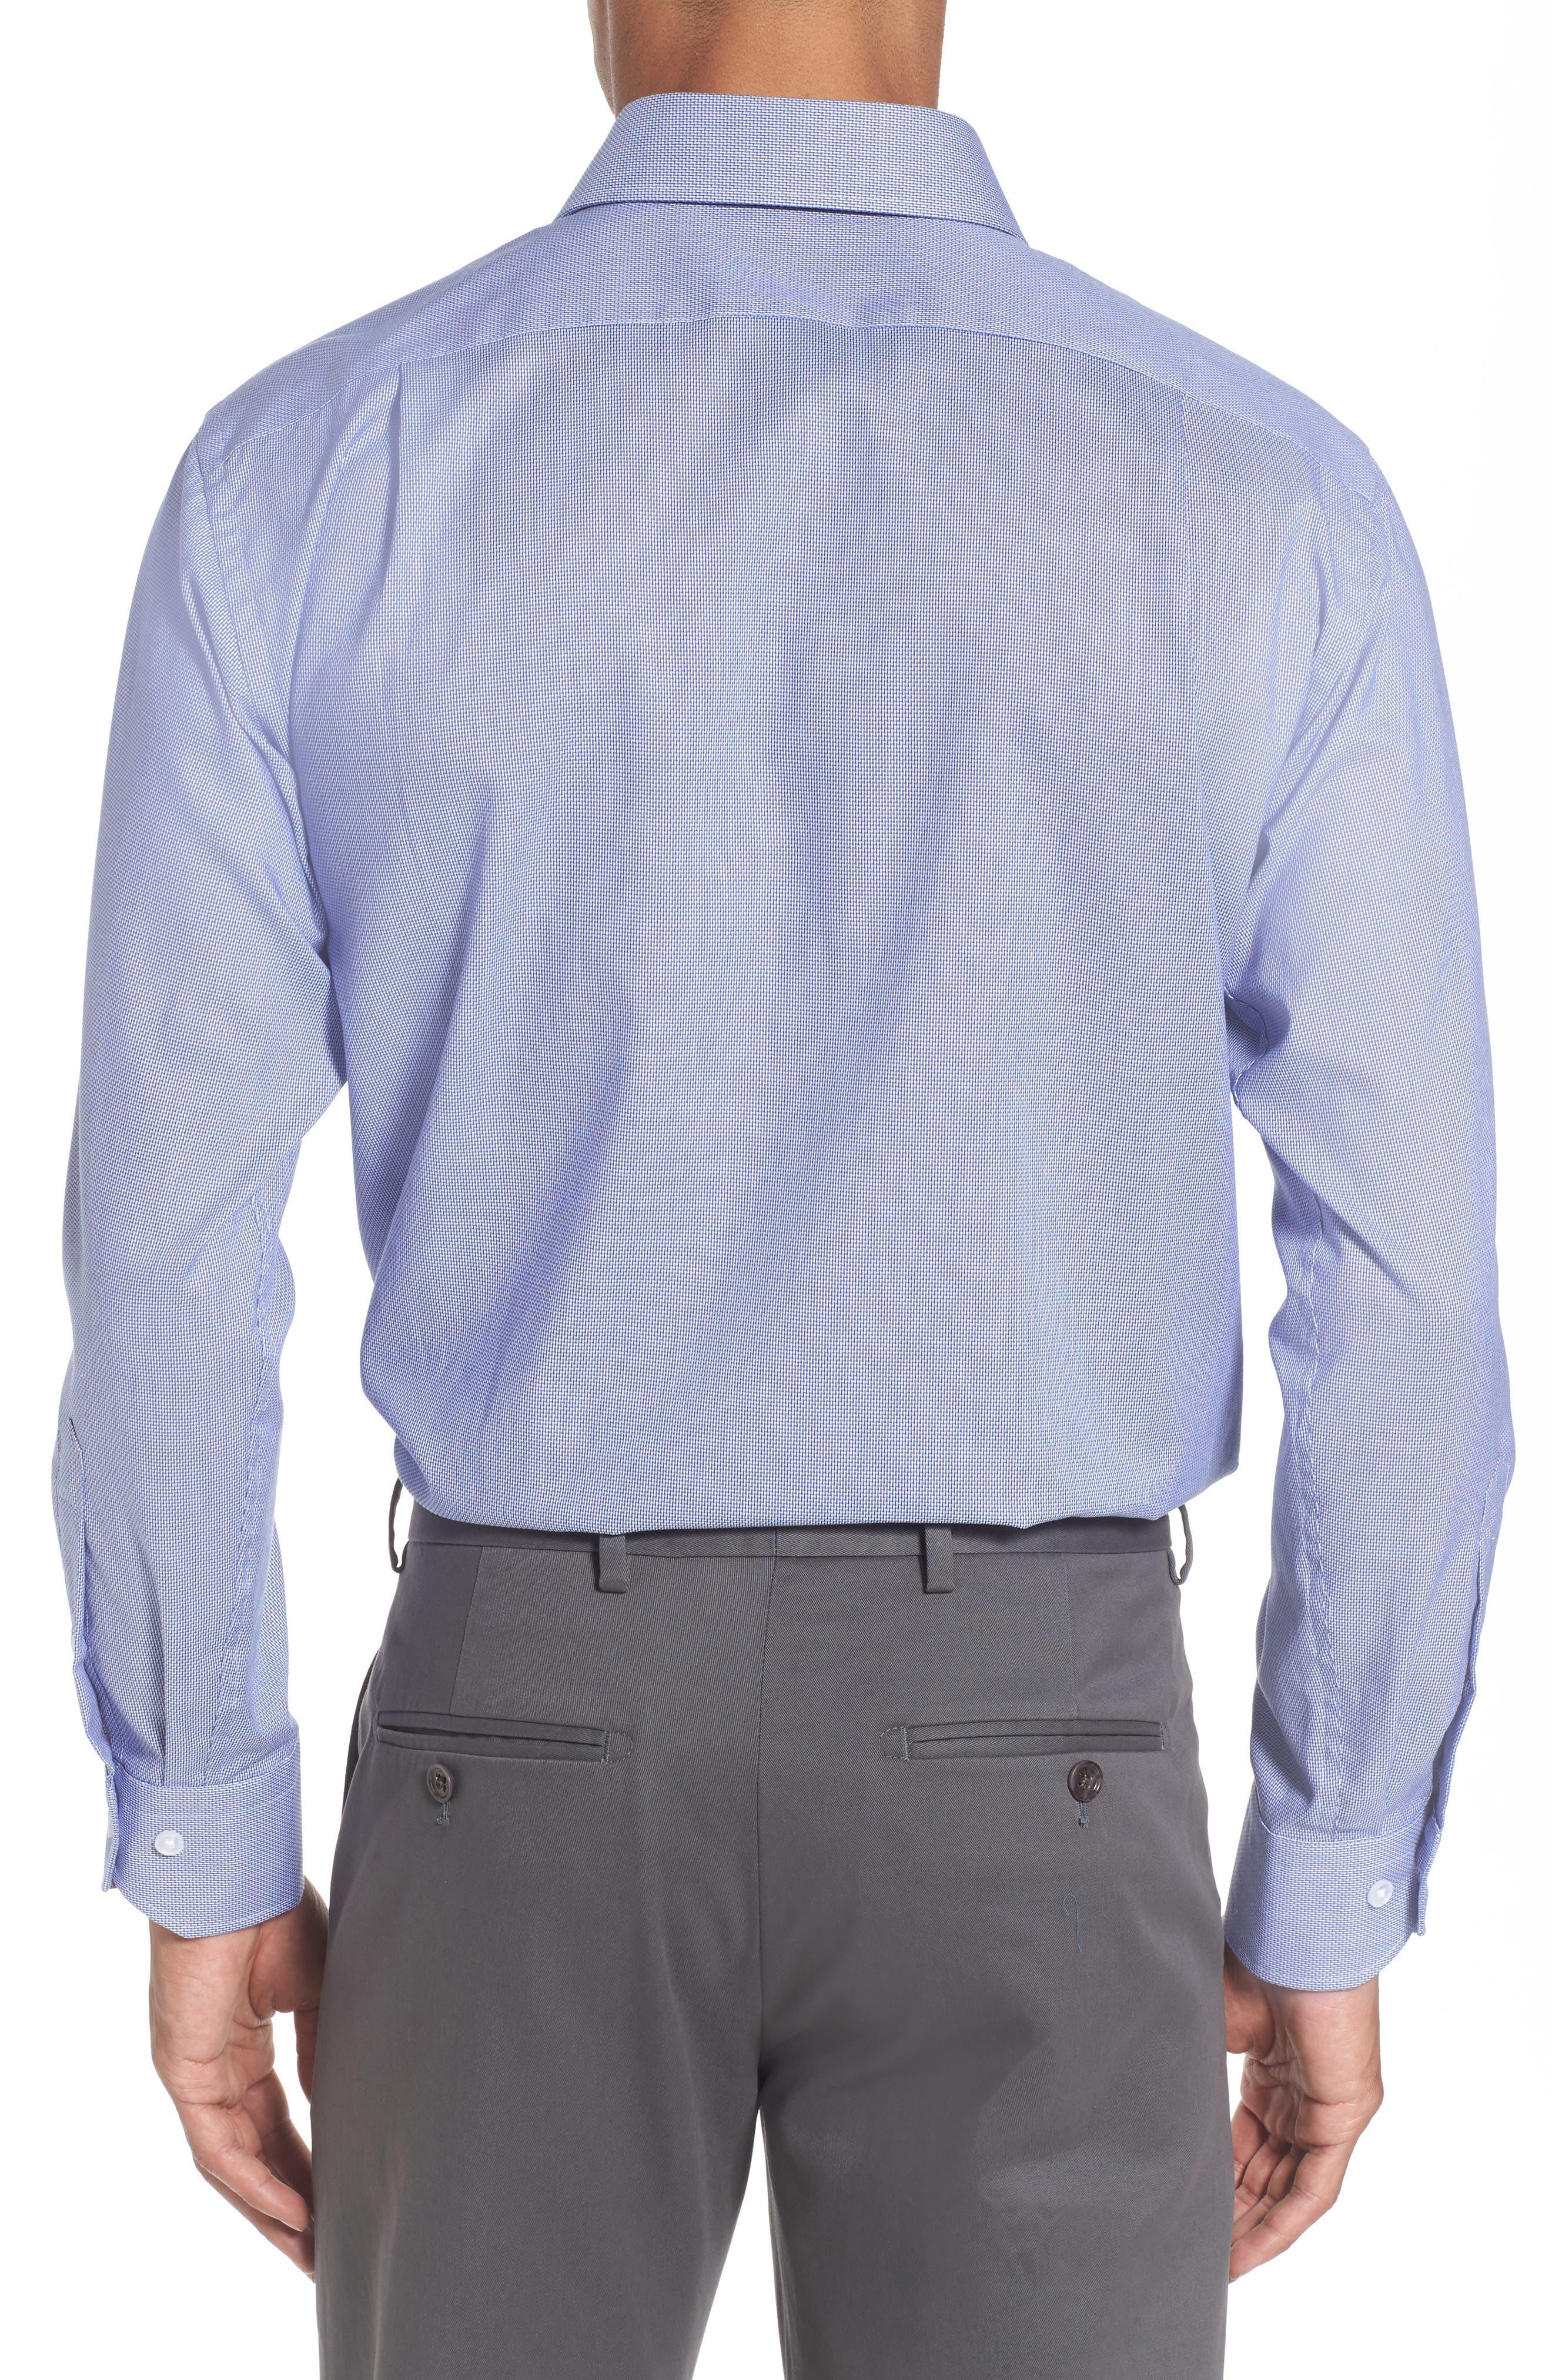 Trim Fit Solid Dress Shirt,                             Alternate thumbnail 2, color,                             Navy